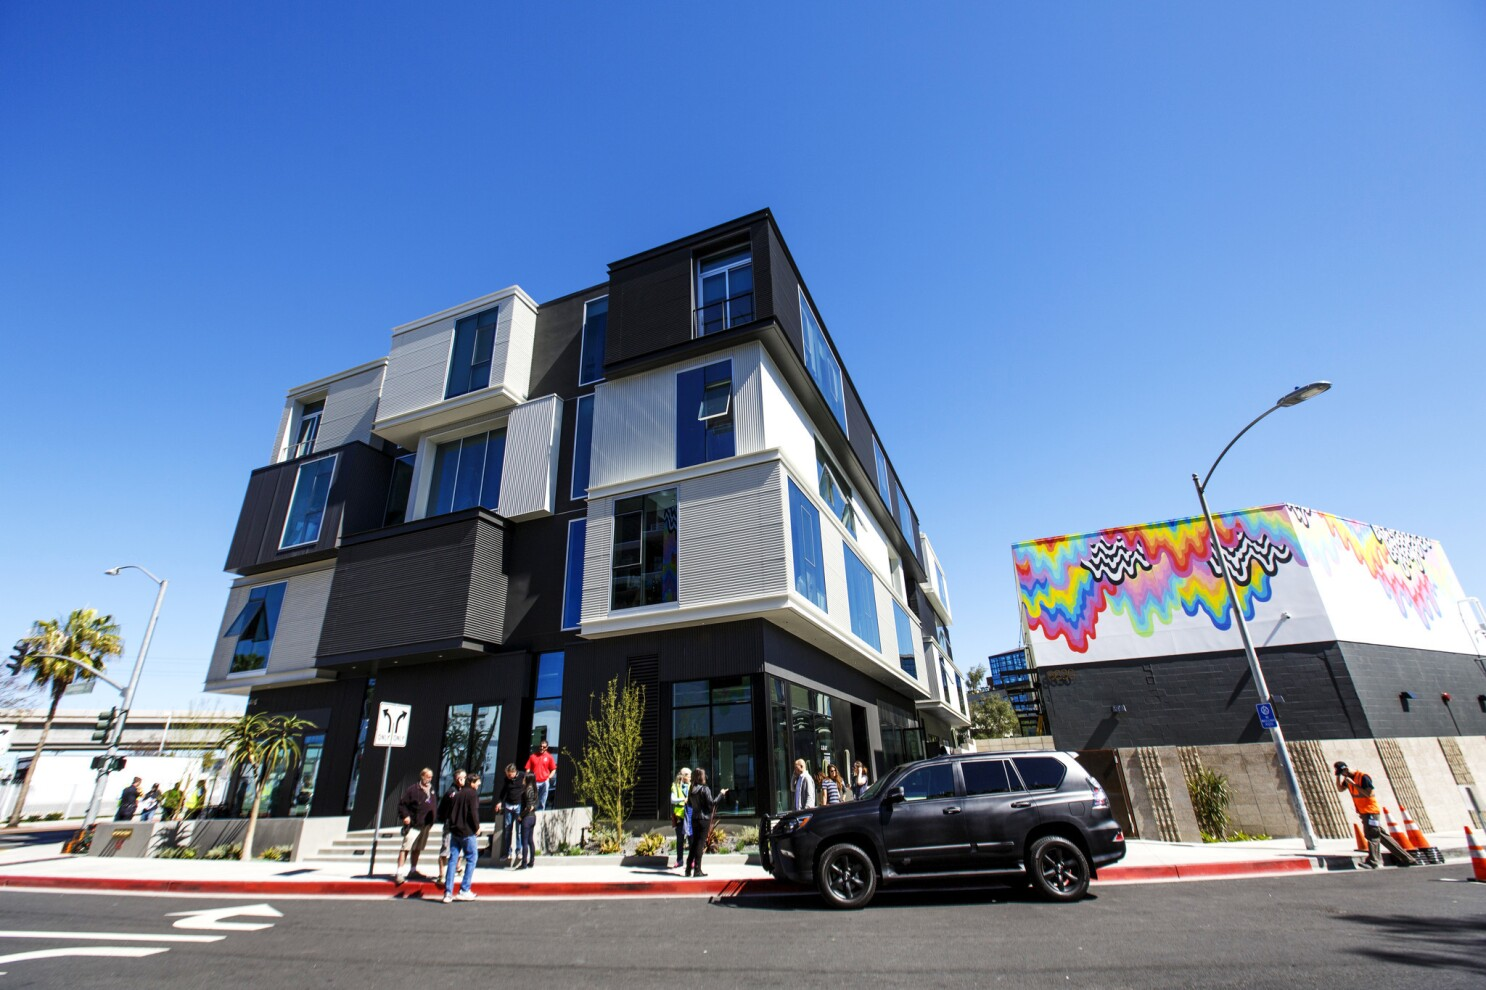 Culver City passes temporary rent control measure